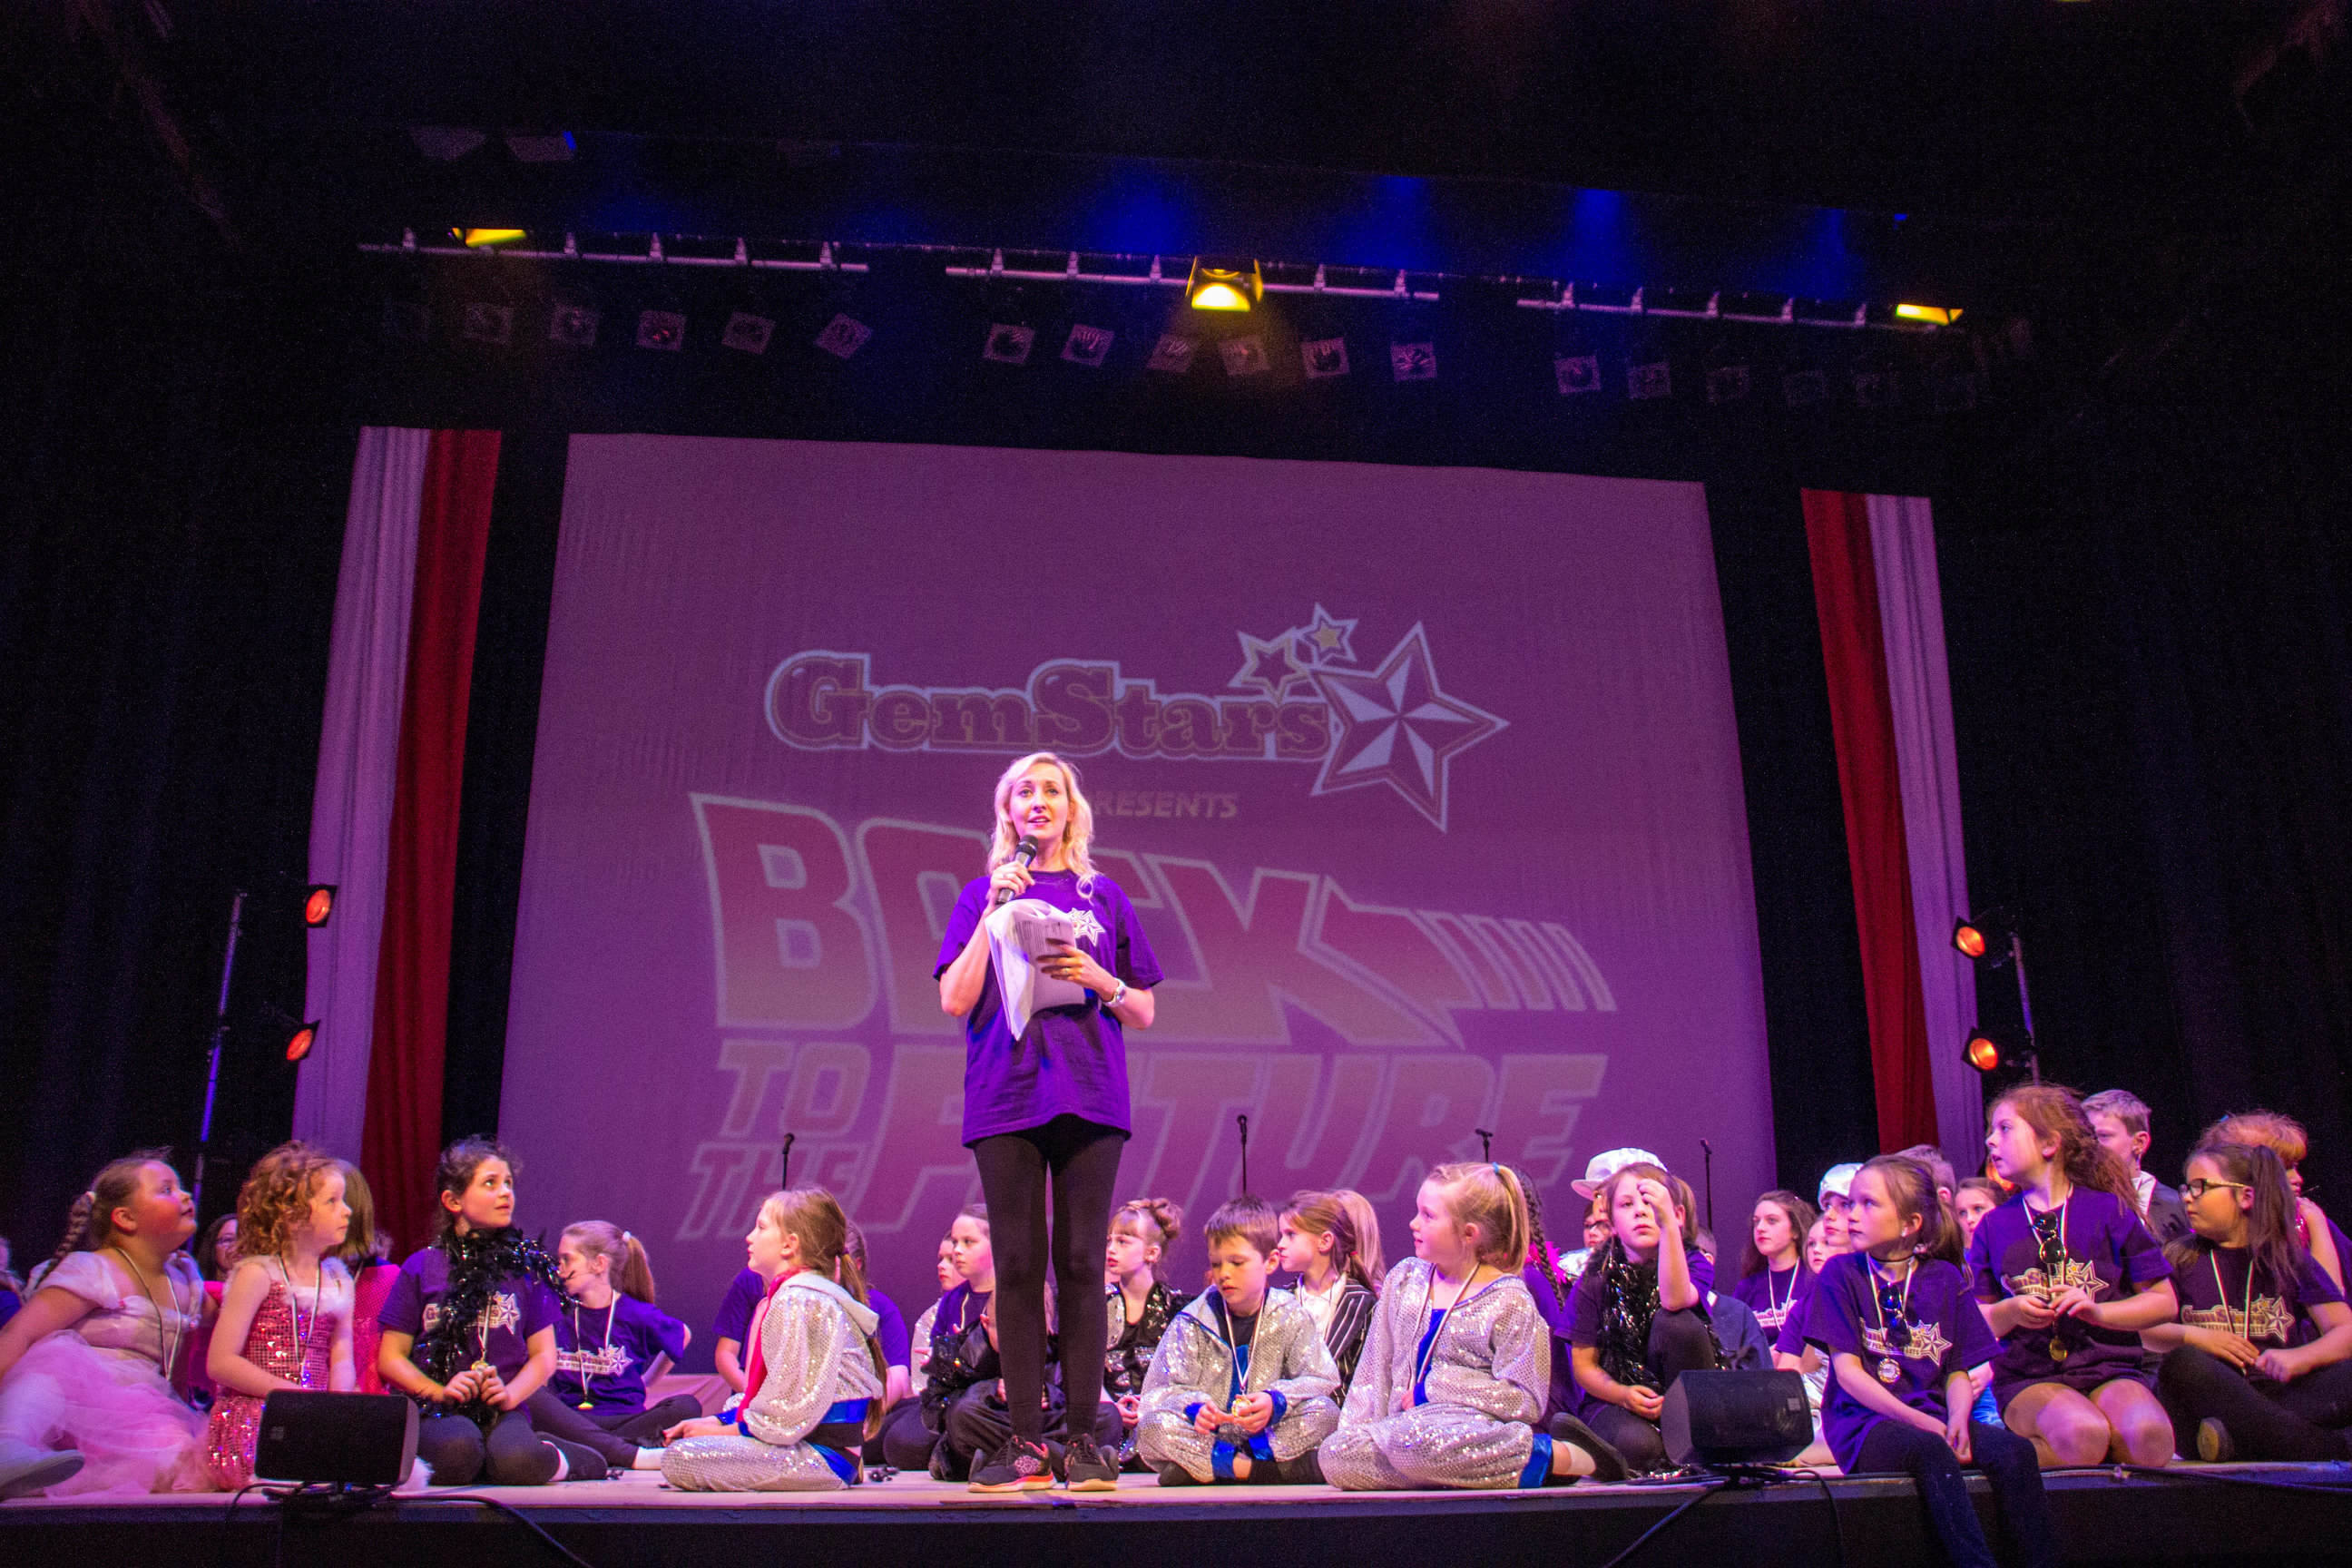 Gemstars School of Performing Arts